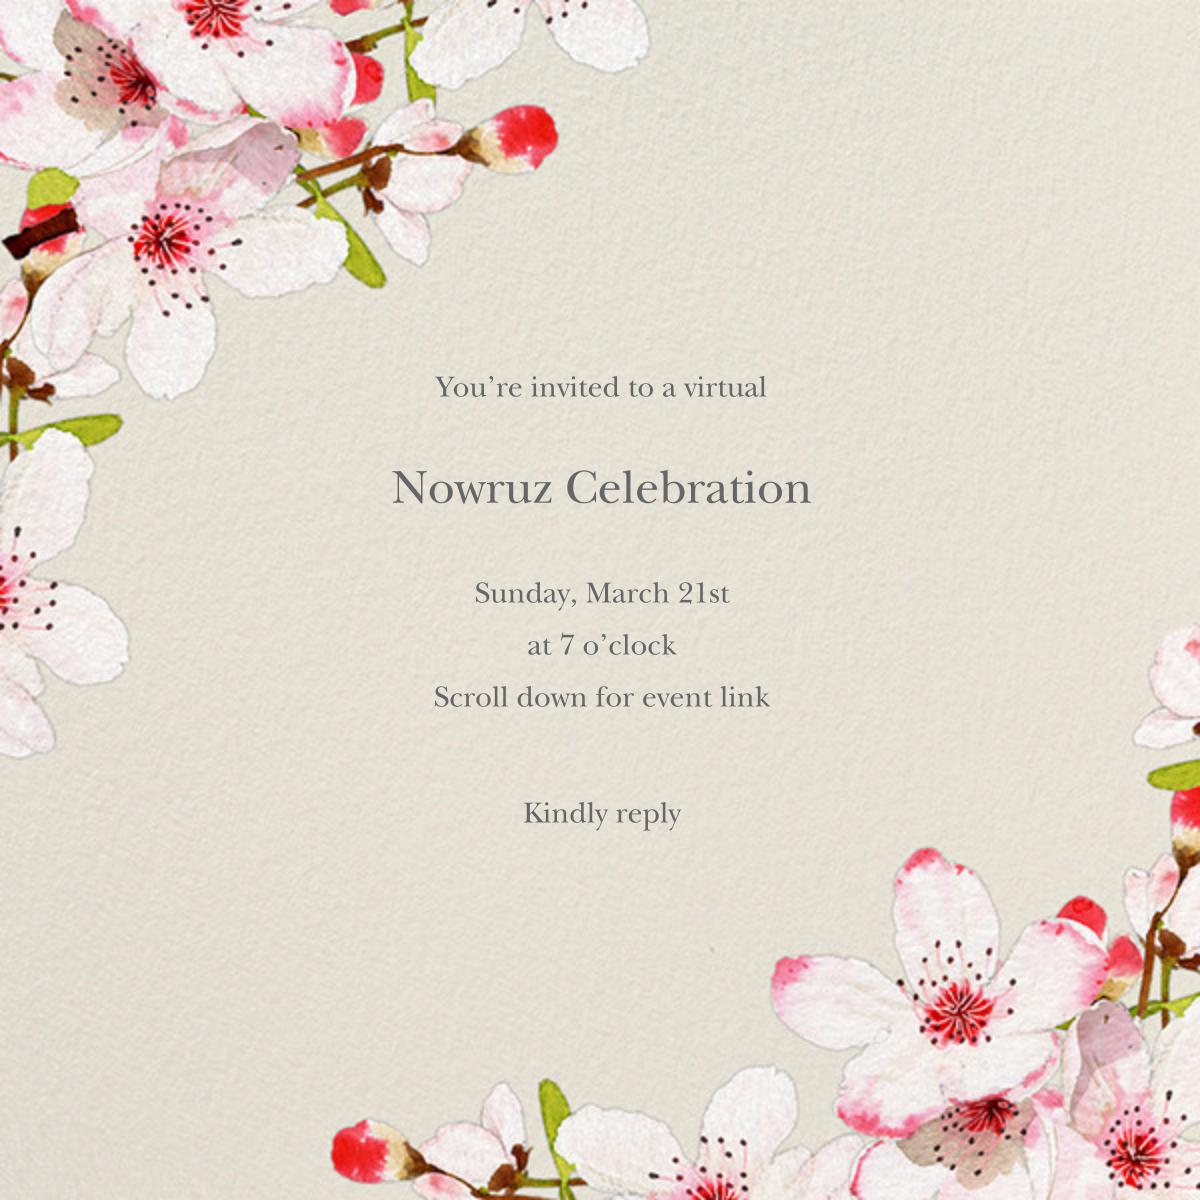 Blushing Blossoms - Felix Doolittle - Virtual parties